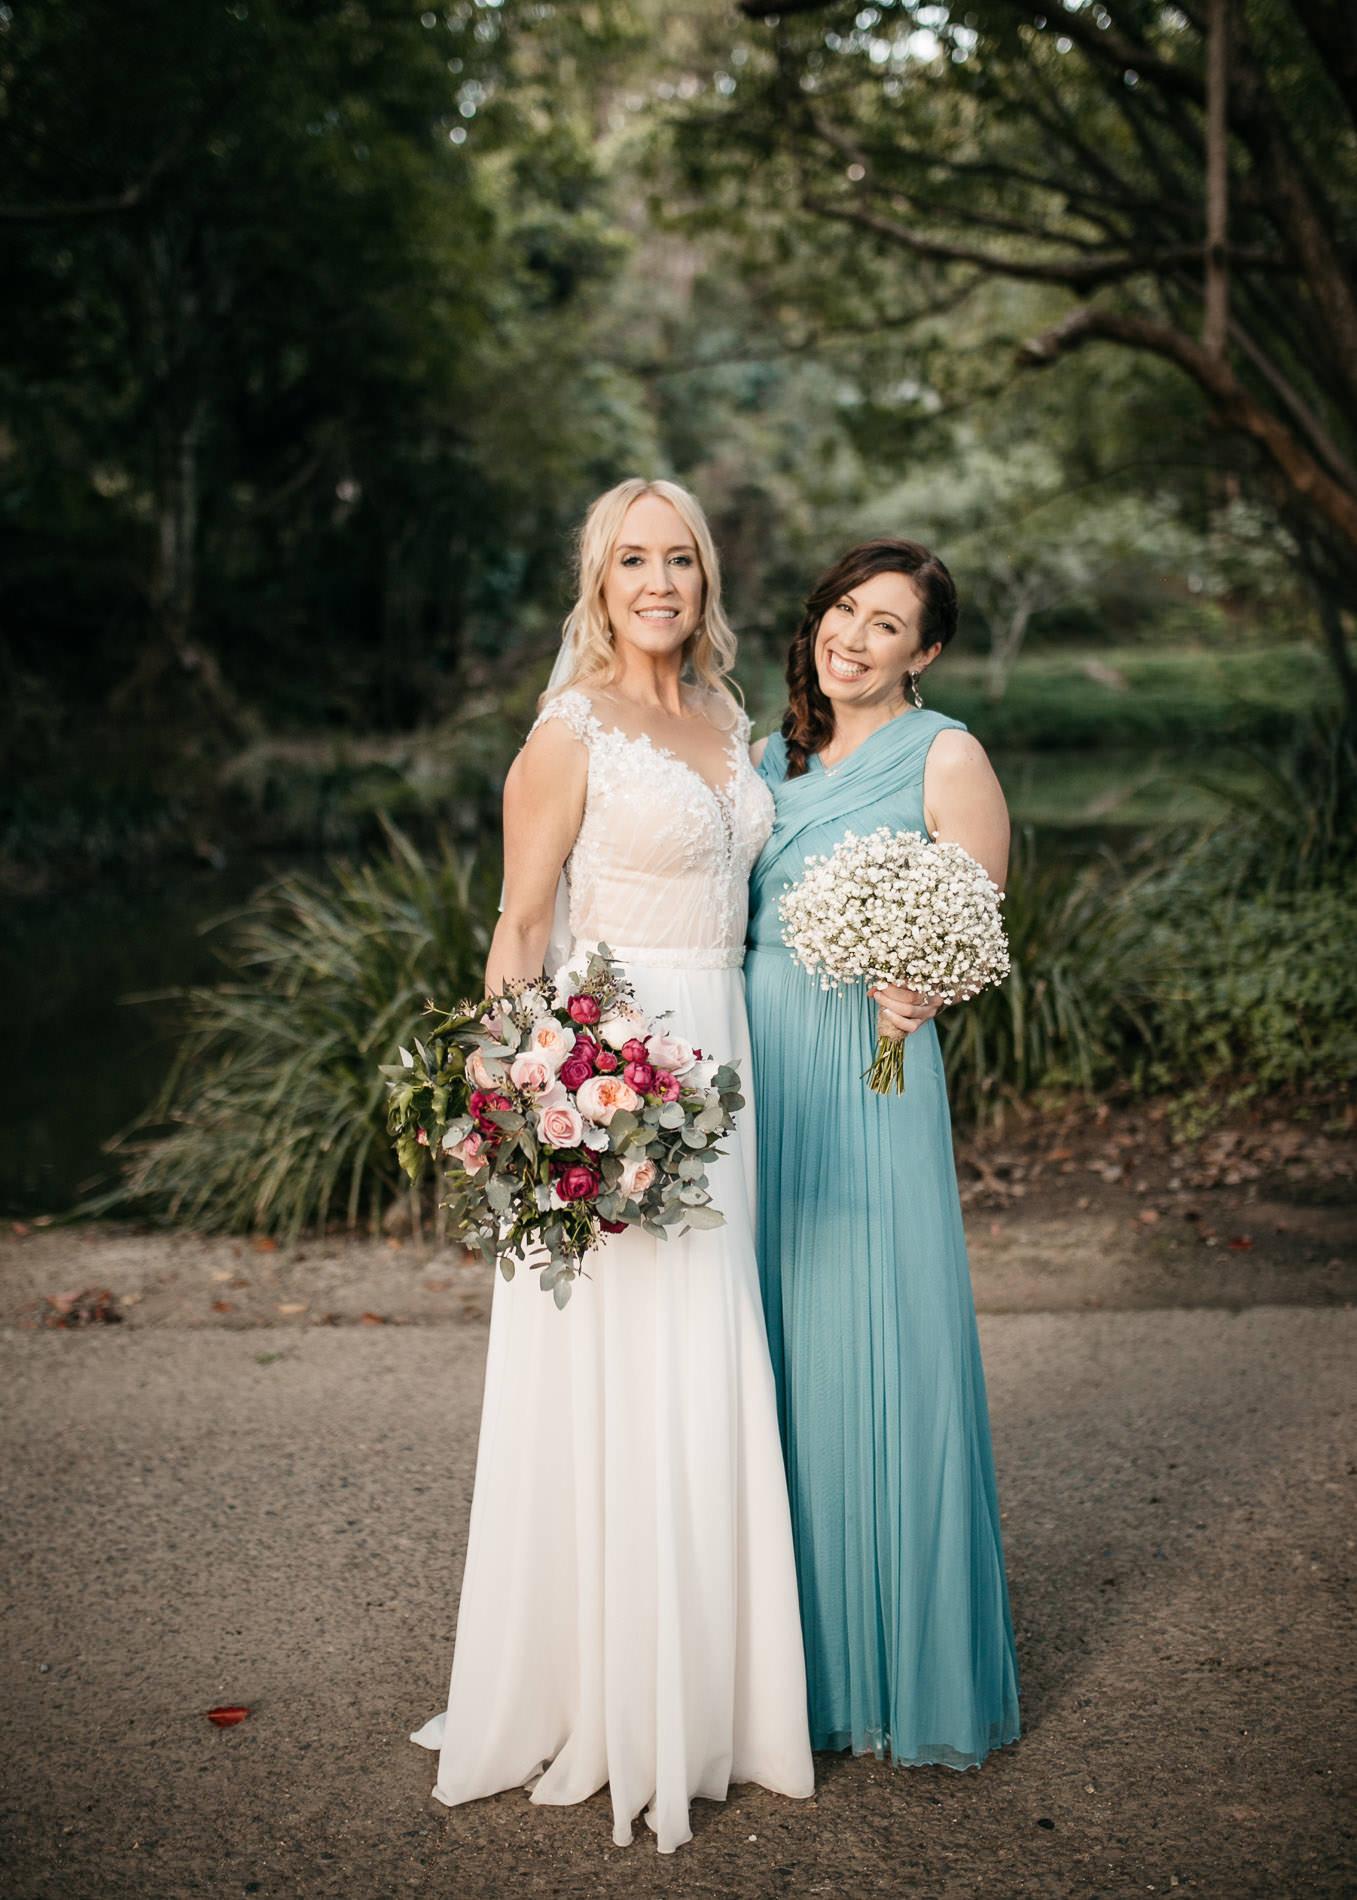 True North Photography_Boomerang Farm_Stacey and Isaac_Gold Coast Wedding_Barm Wedding_Hinterland Wedding-155.jpg